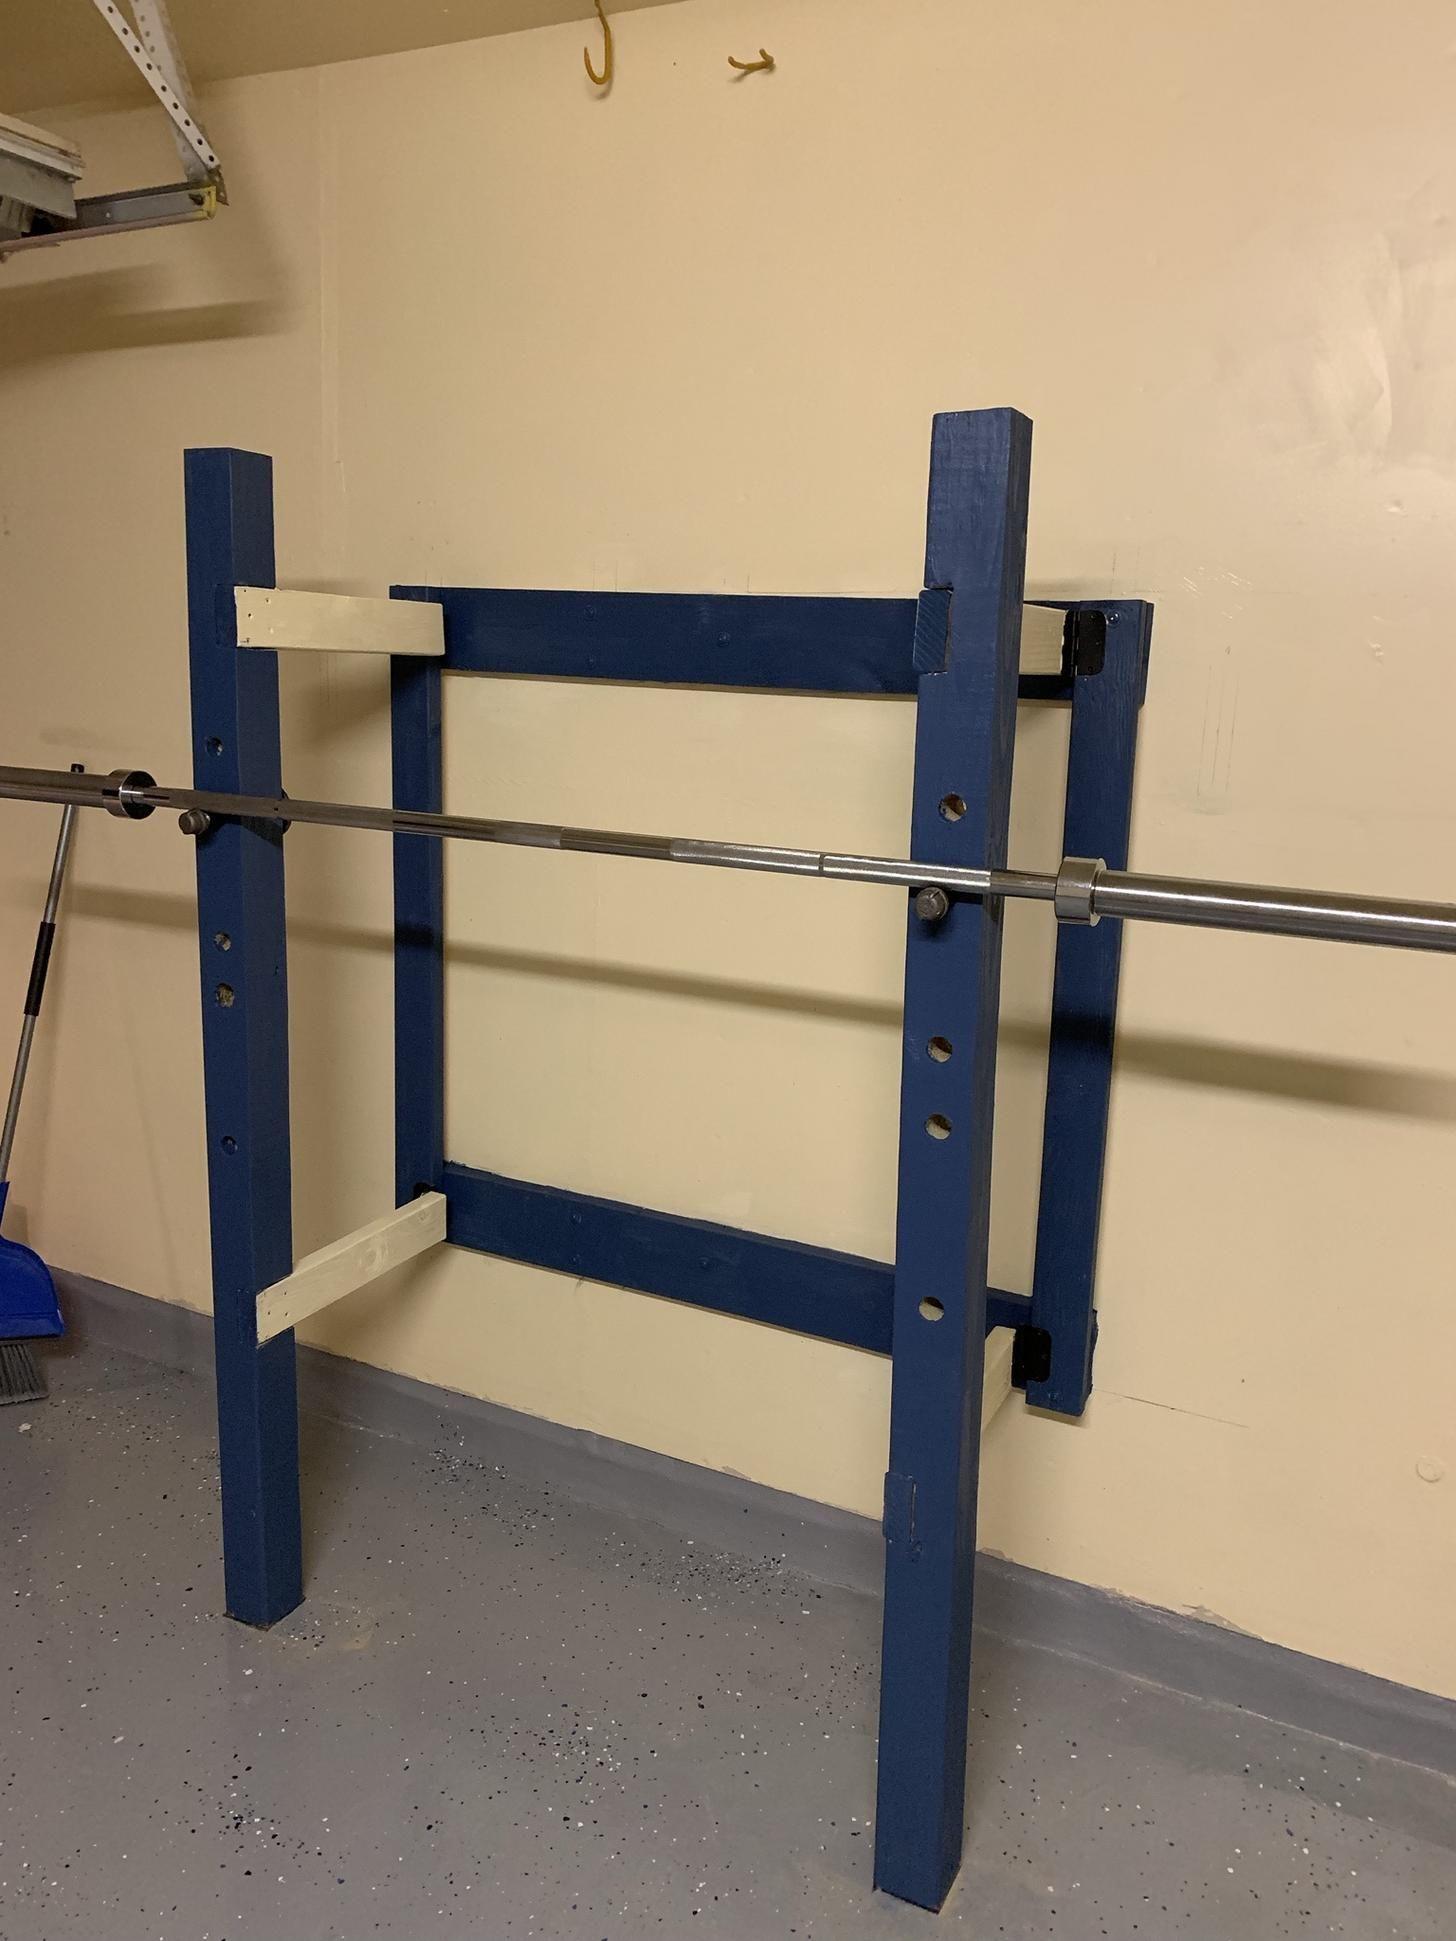 Diy folding squat rack imgur diy home gym squat rack